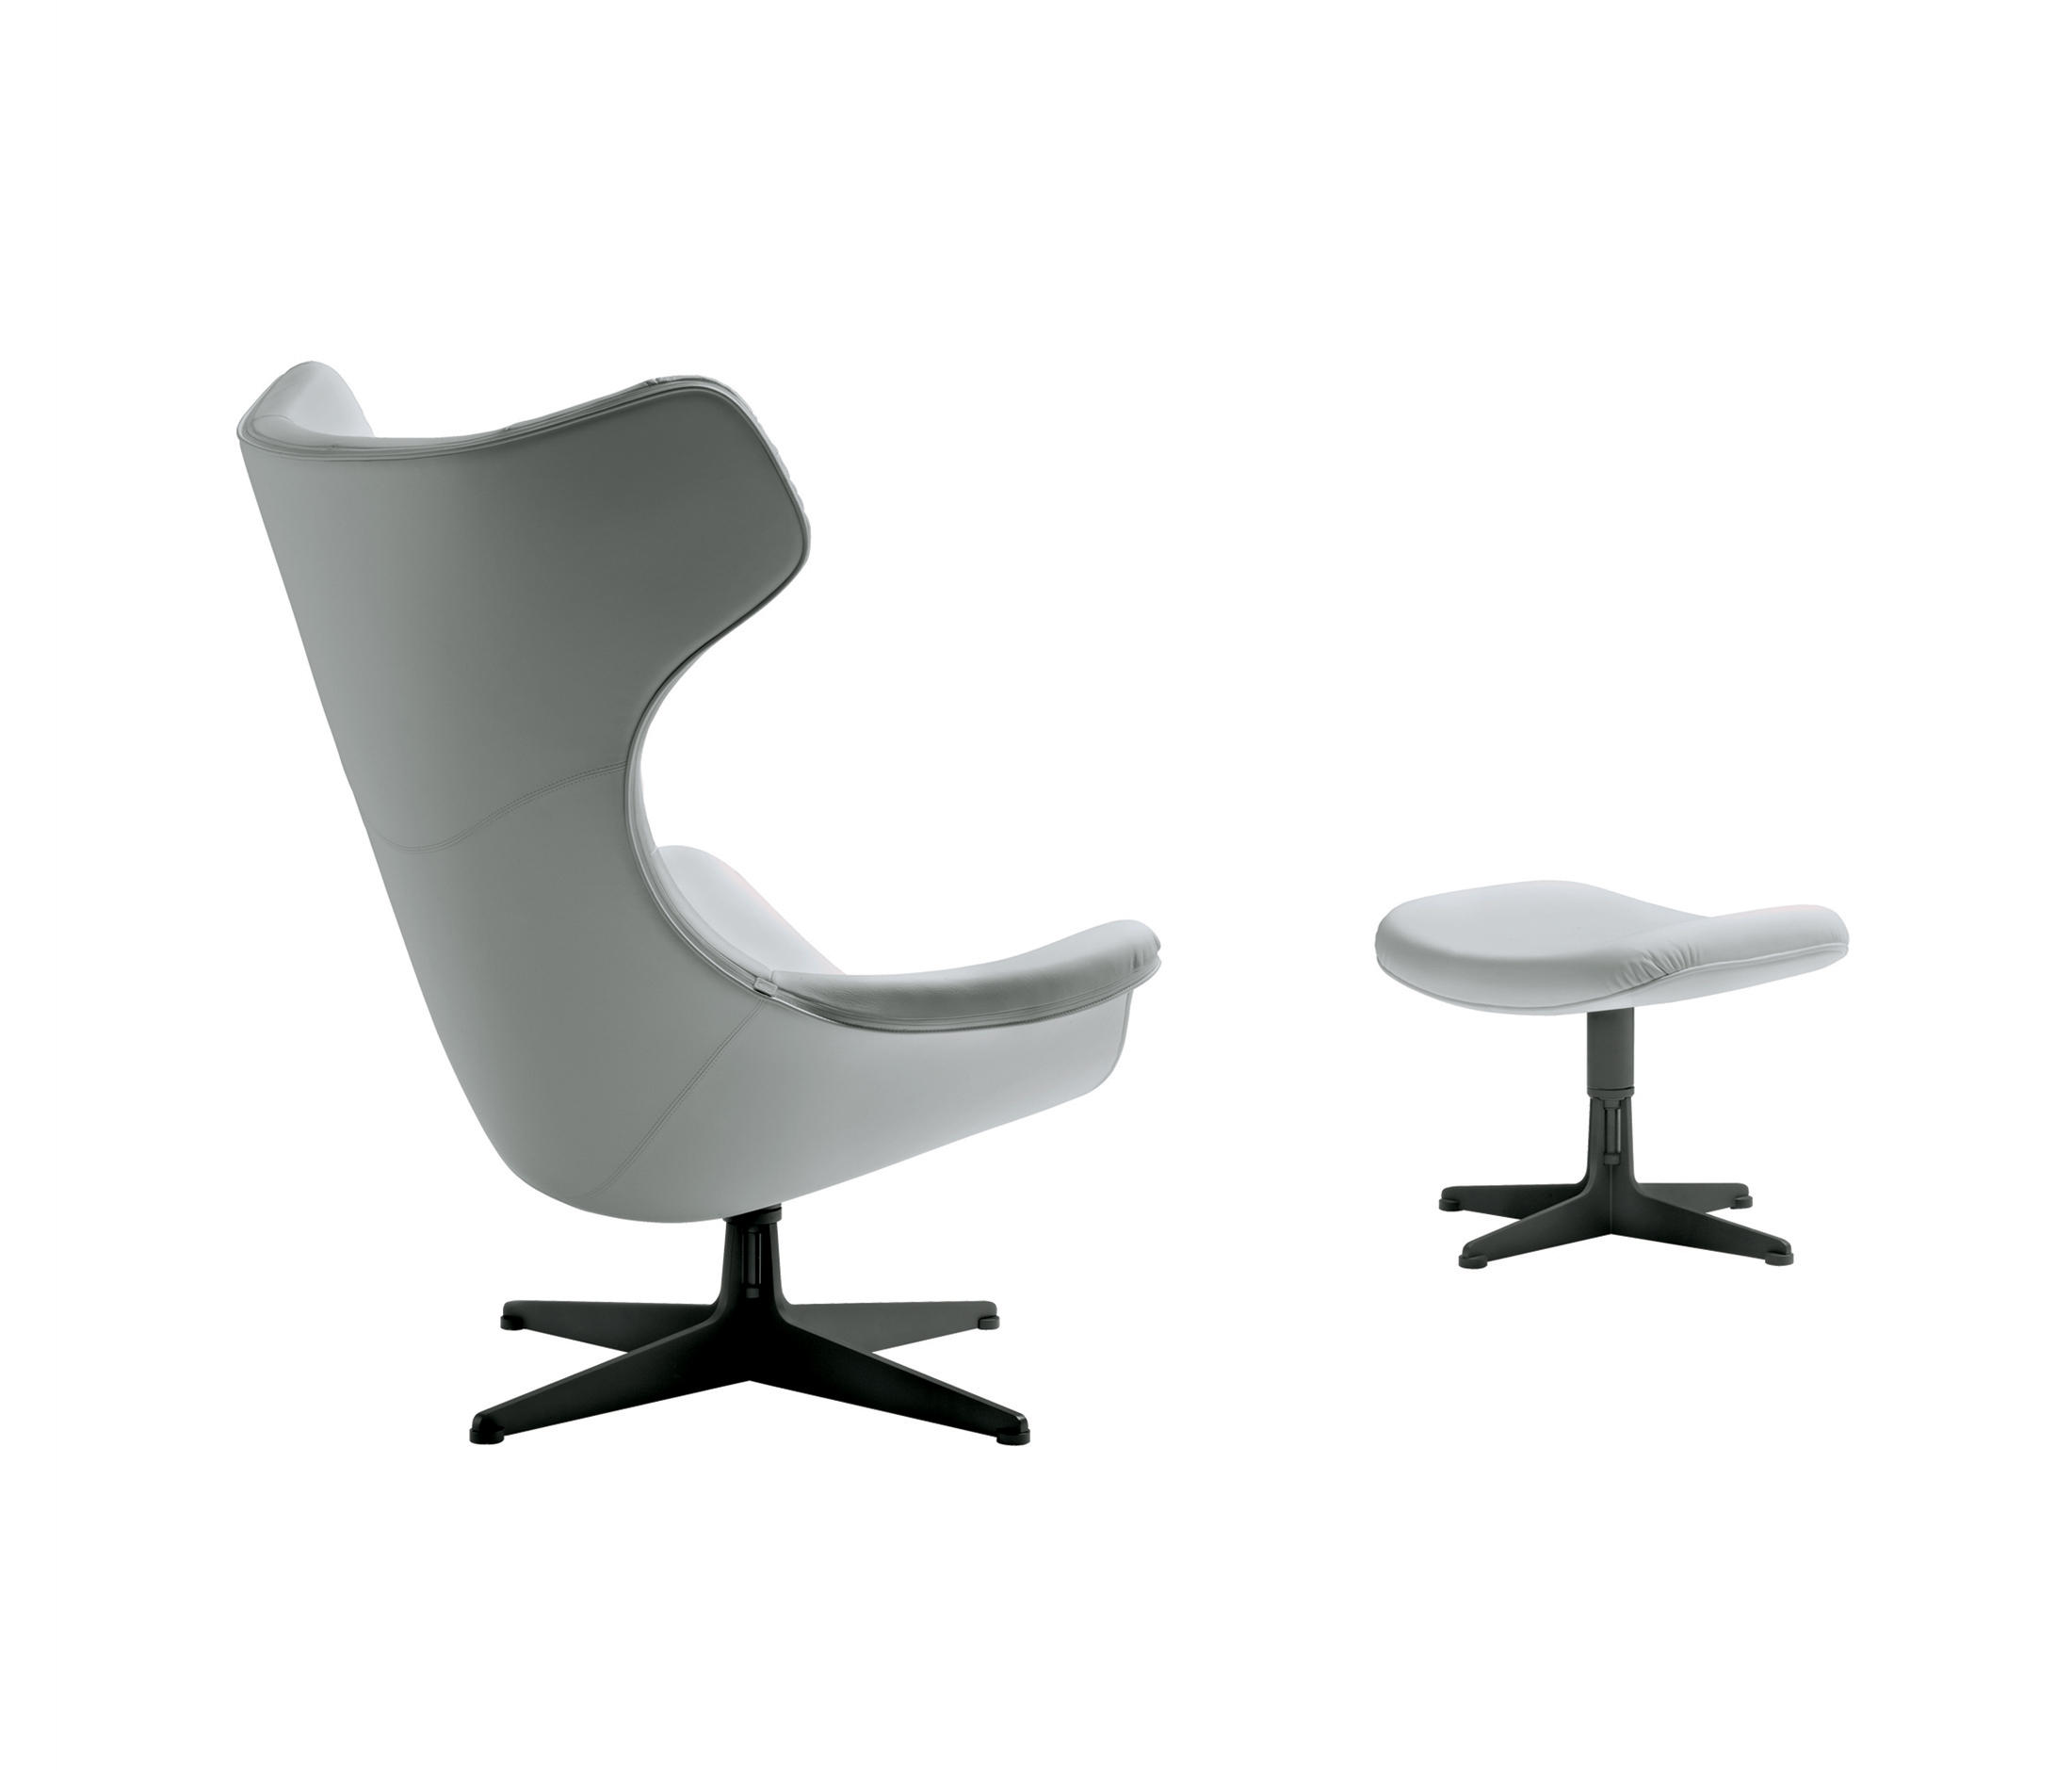 regina ii sessel von poltrona frau architonic. Black Bedroom Furniture Sets. Home Design Ideas